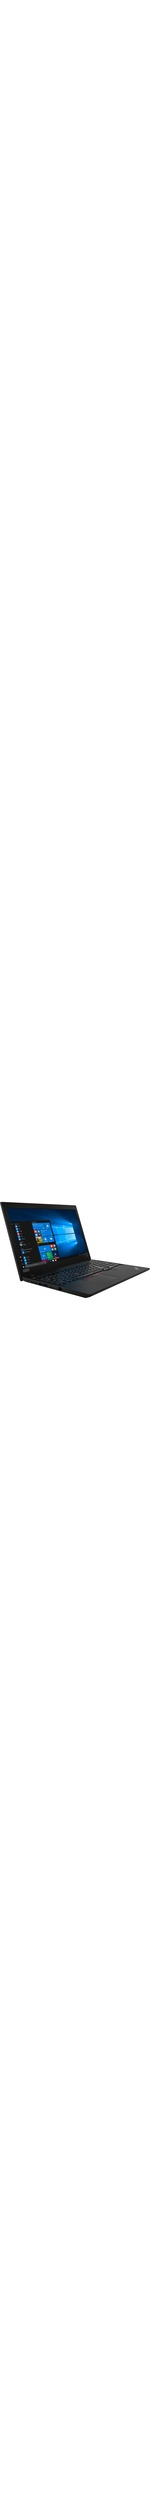 Lenovo ThinkPad L590 20Q700ALUK 39.6 cm 15.6And#34; Notebook - 1920 x 1080 - Core i7 i7-8565U - 16 GB RAM - 512 GB SSD